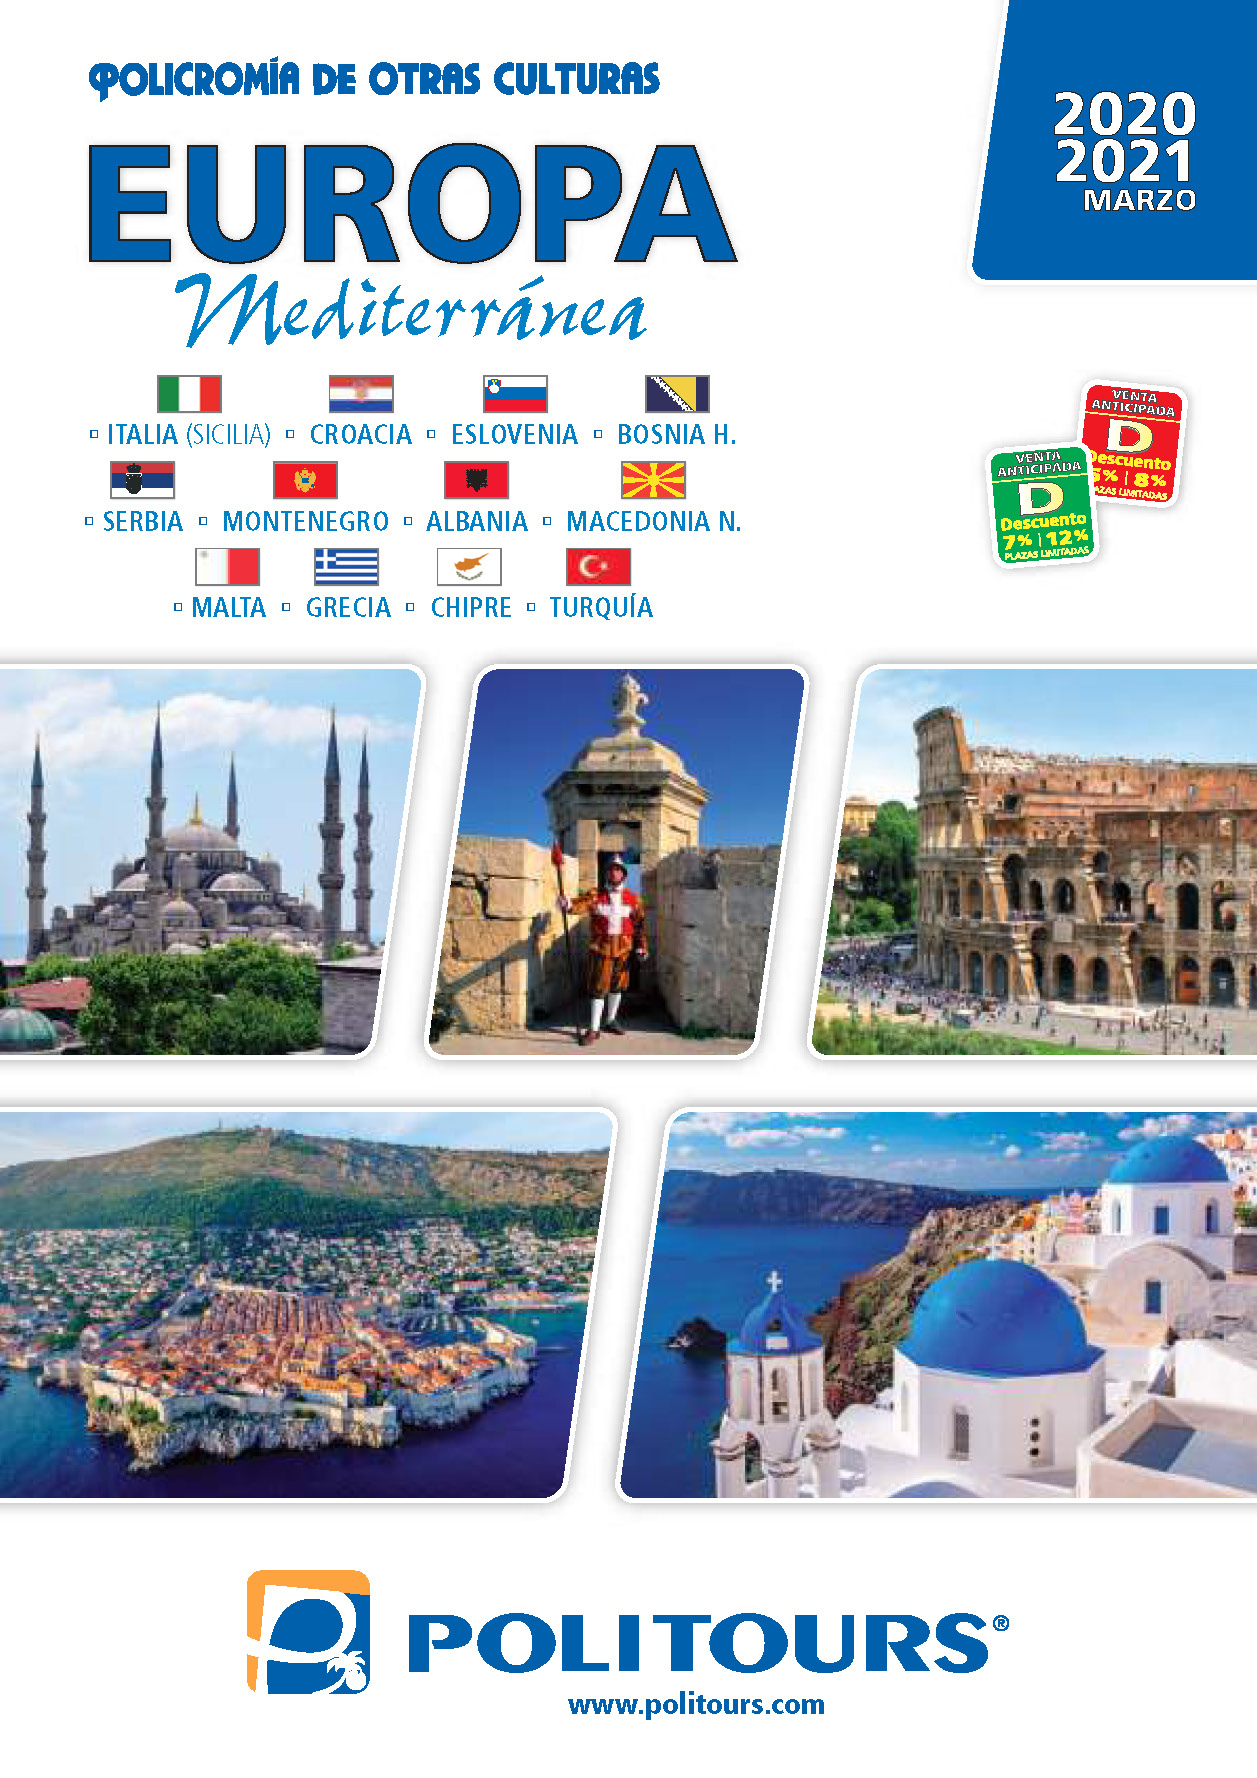 Catalogo Politours Europa Mediterranea 2020-2021